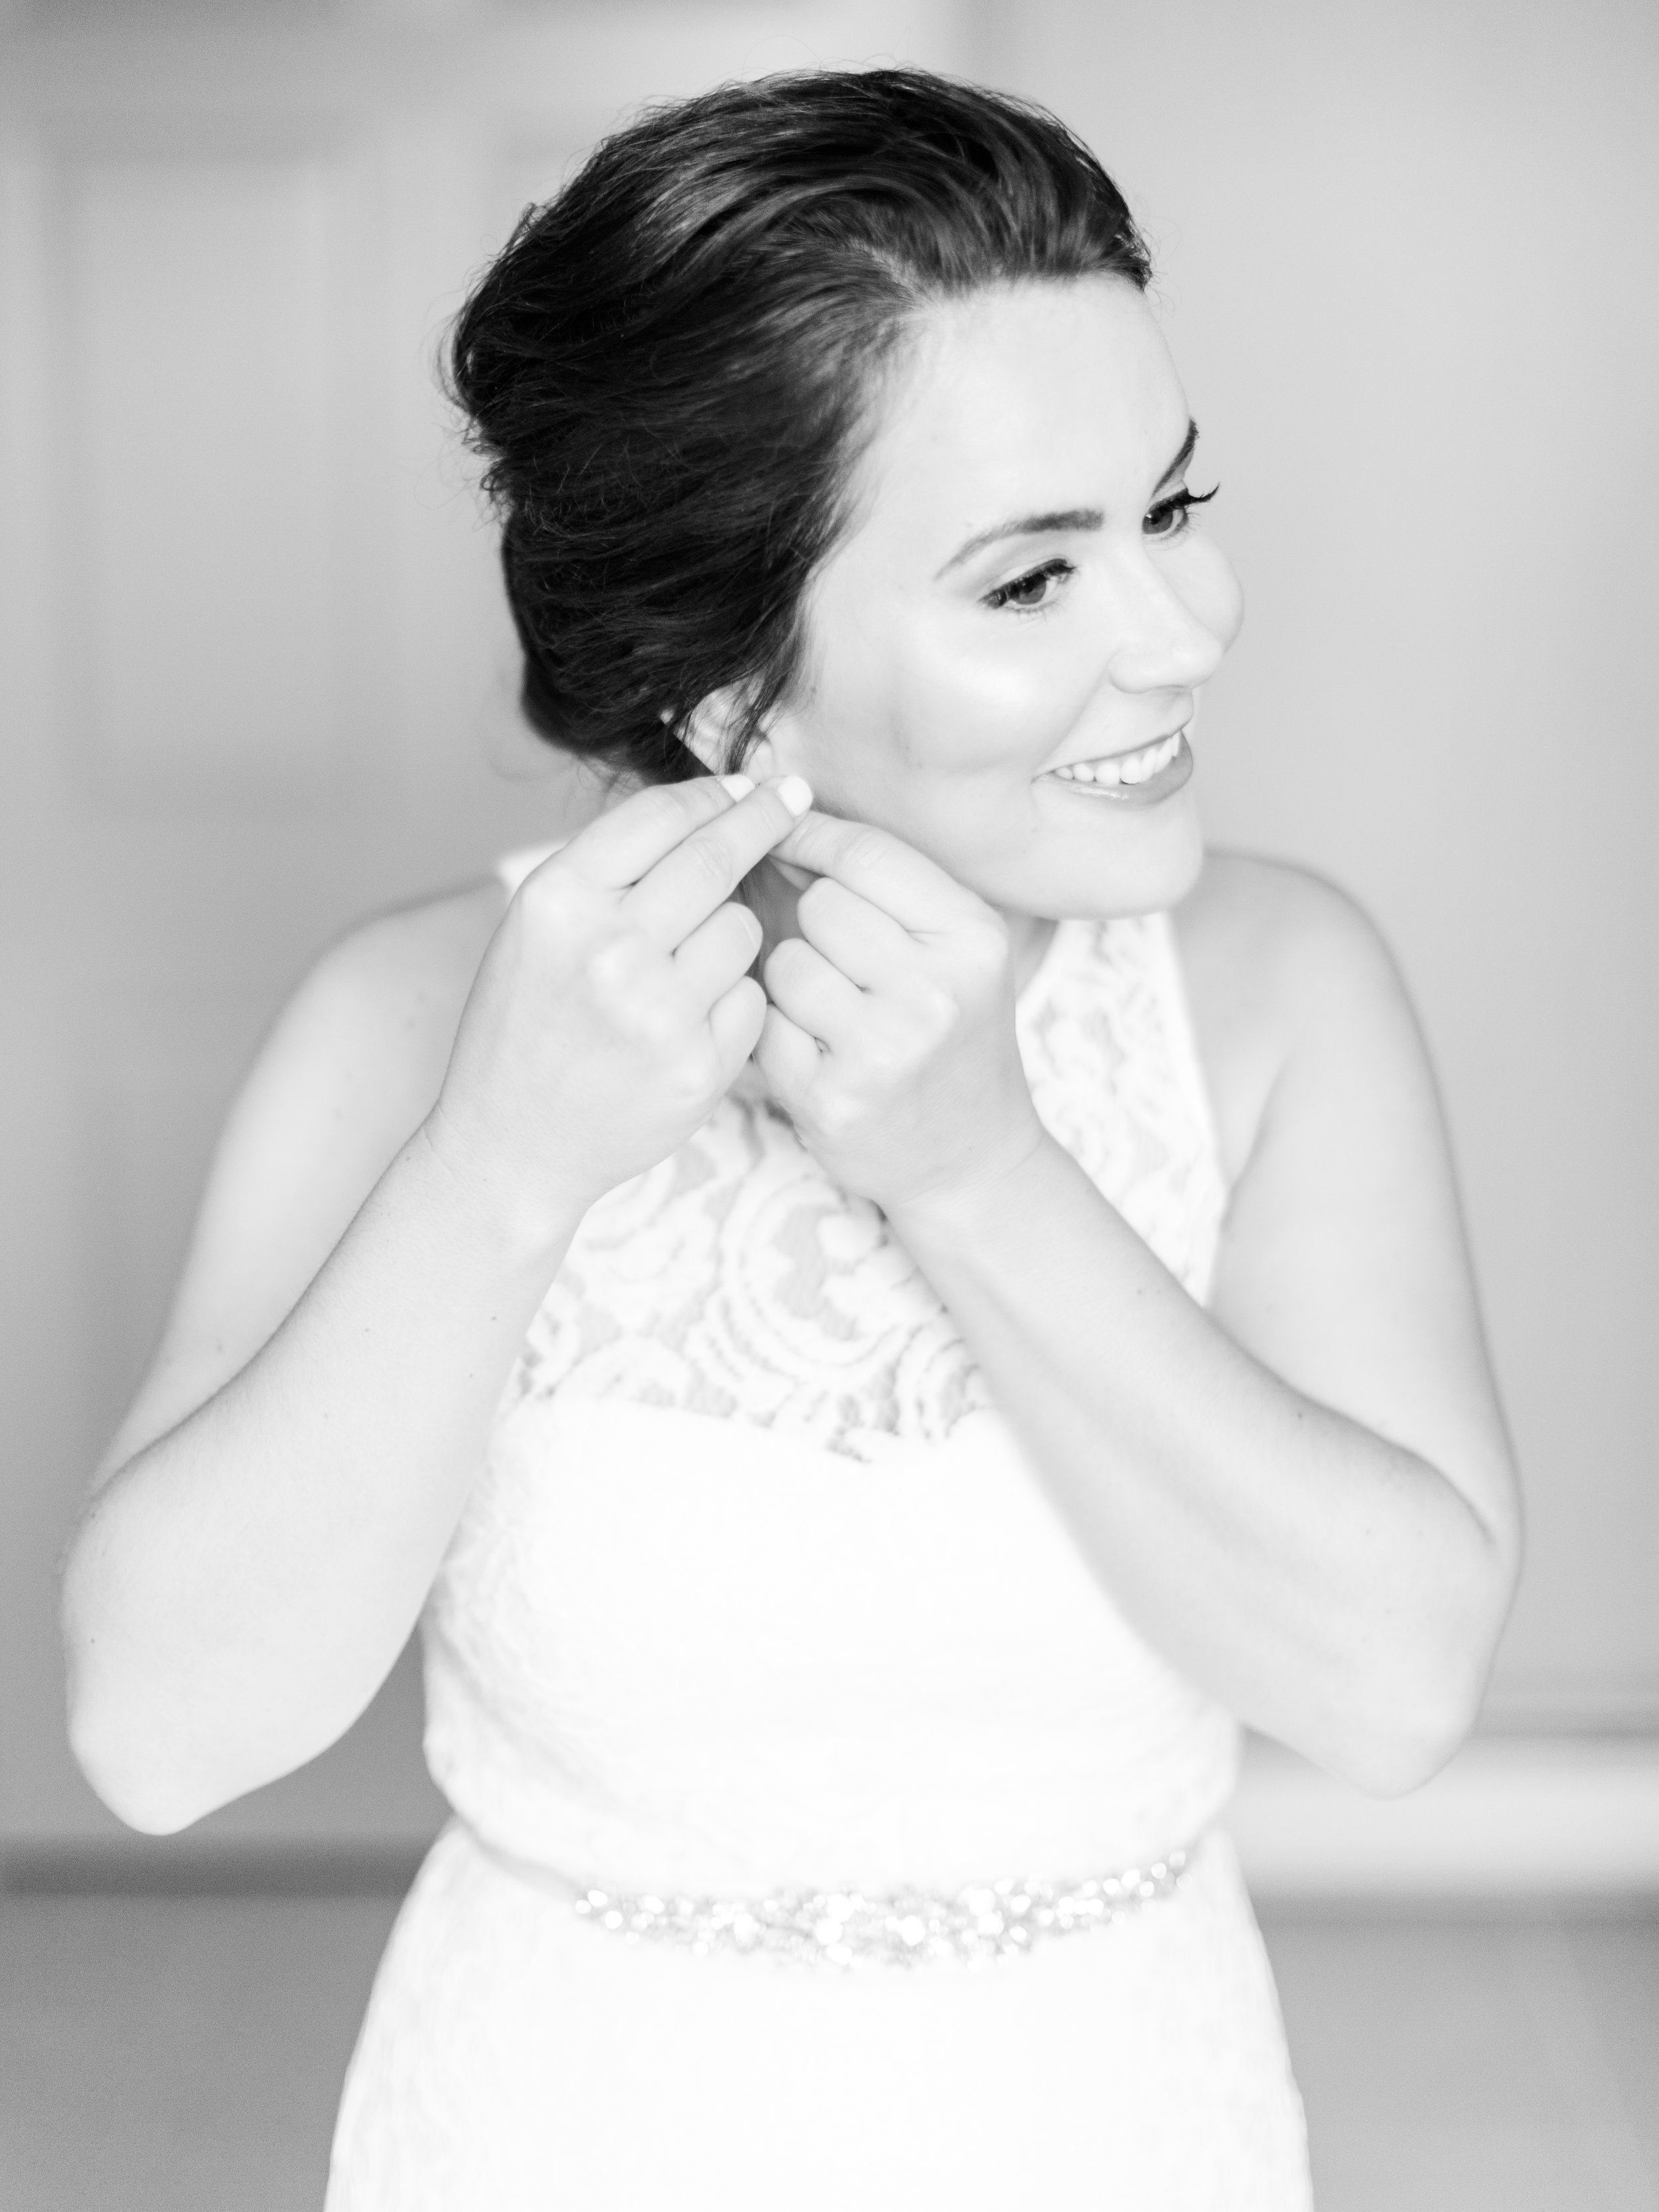 Zoller+Wedding+Getting+Ready-31.jpg